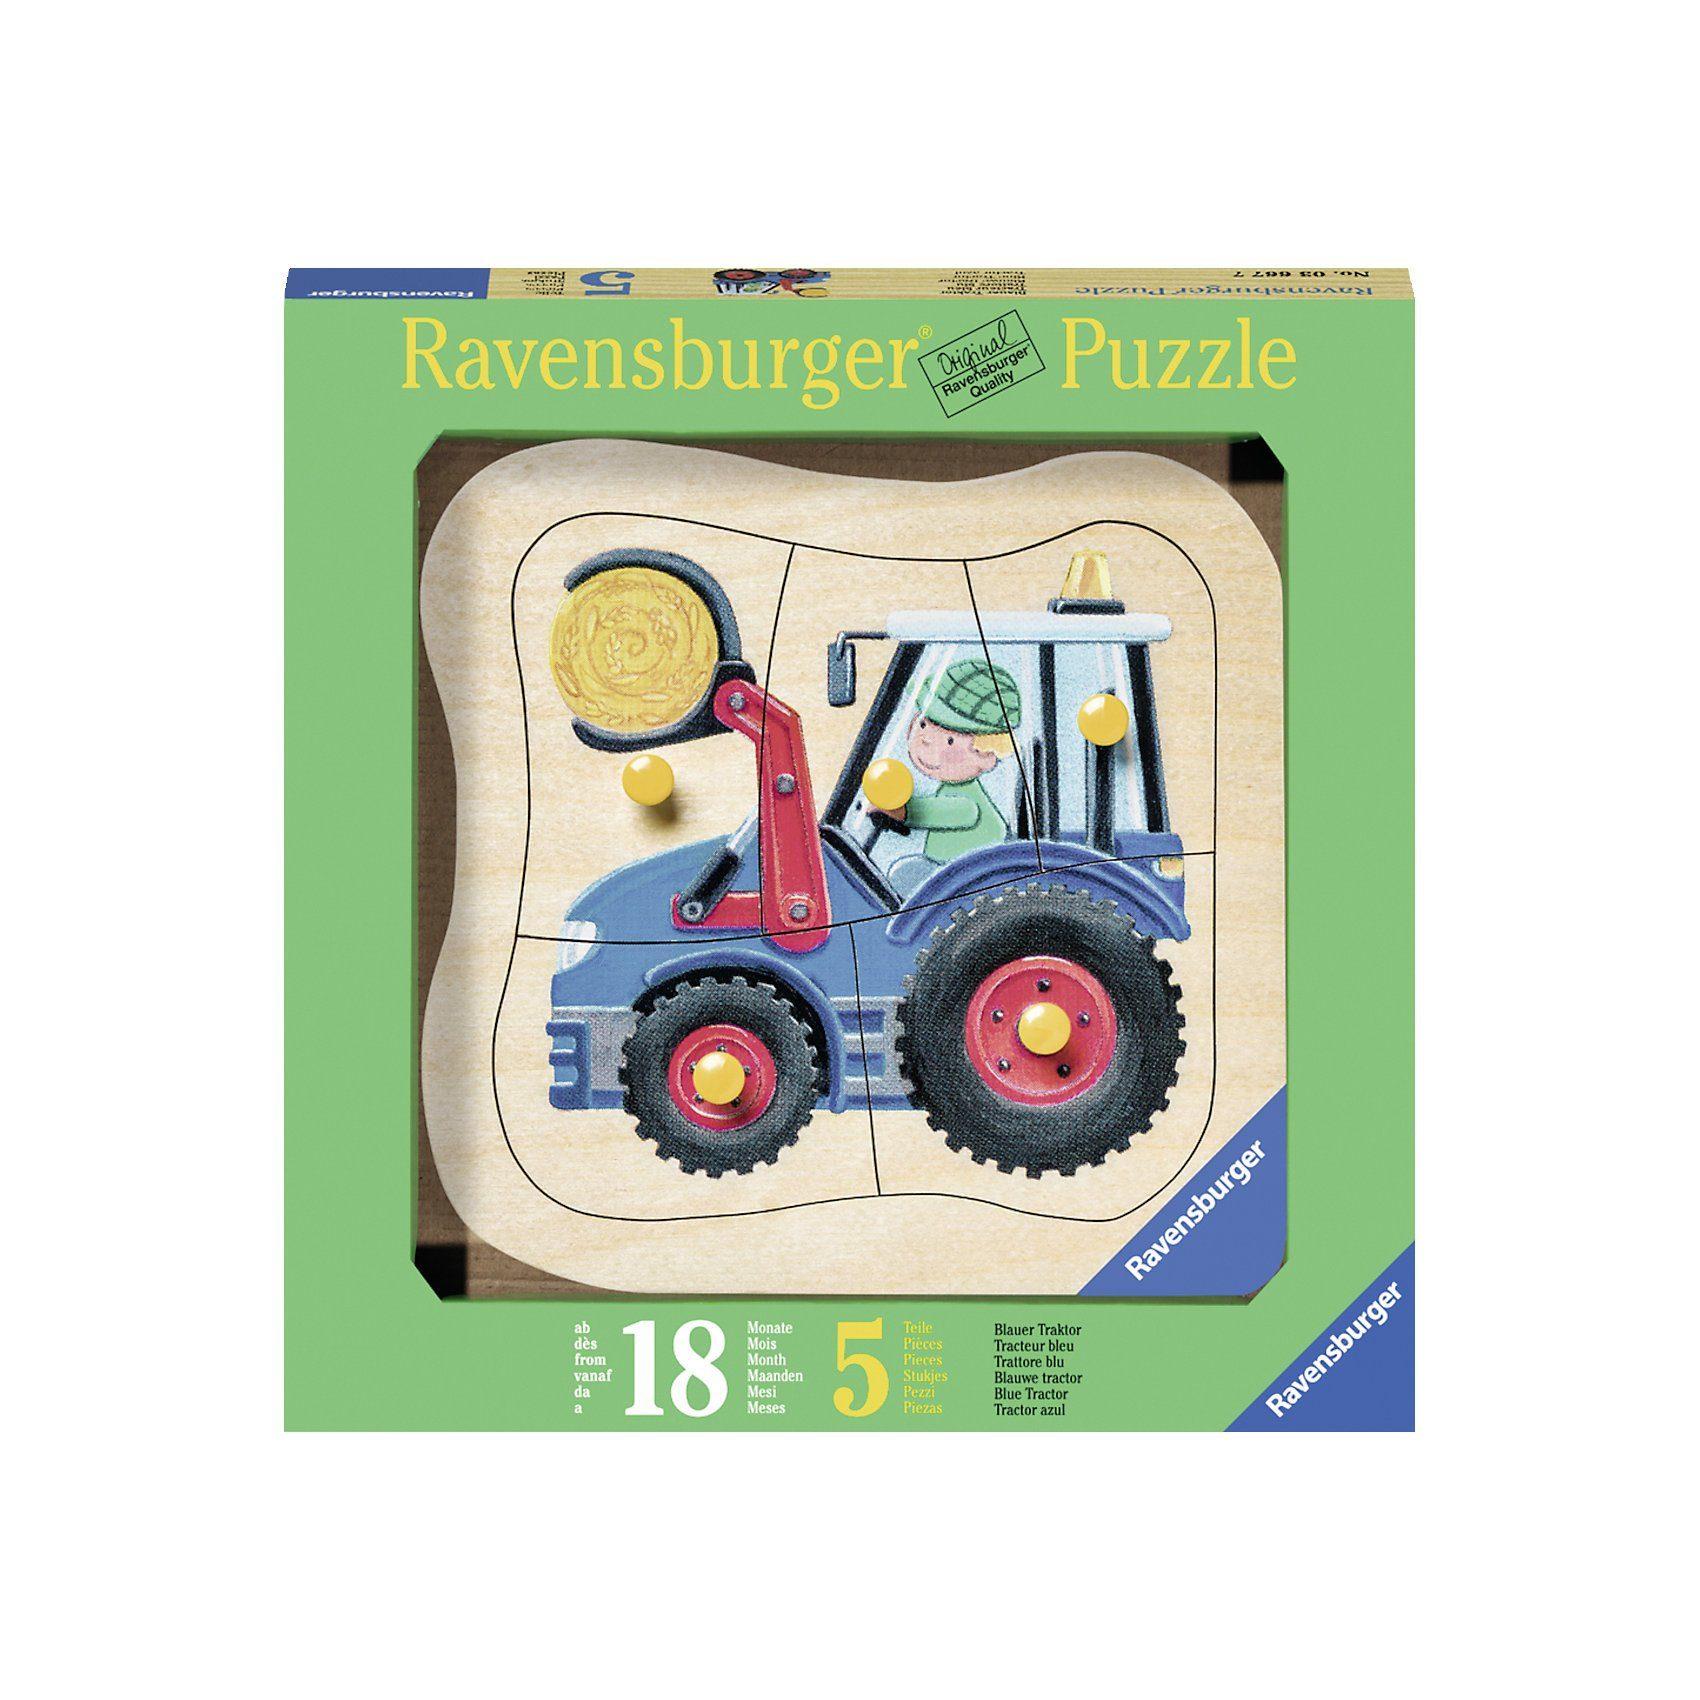 Ravensburger Holzpuzzle Blauer Traktor 5 Teile